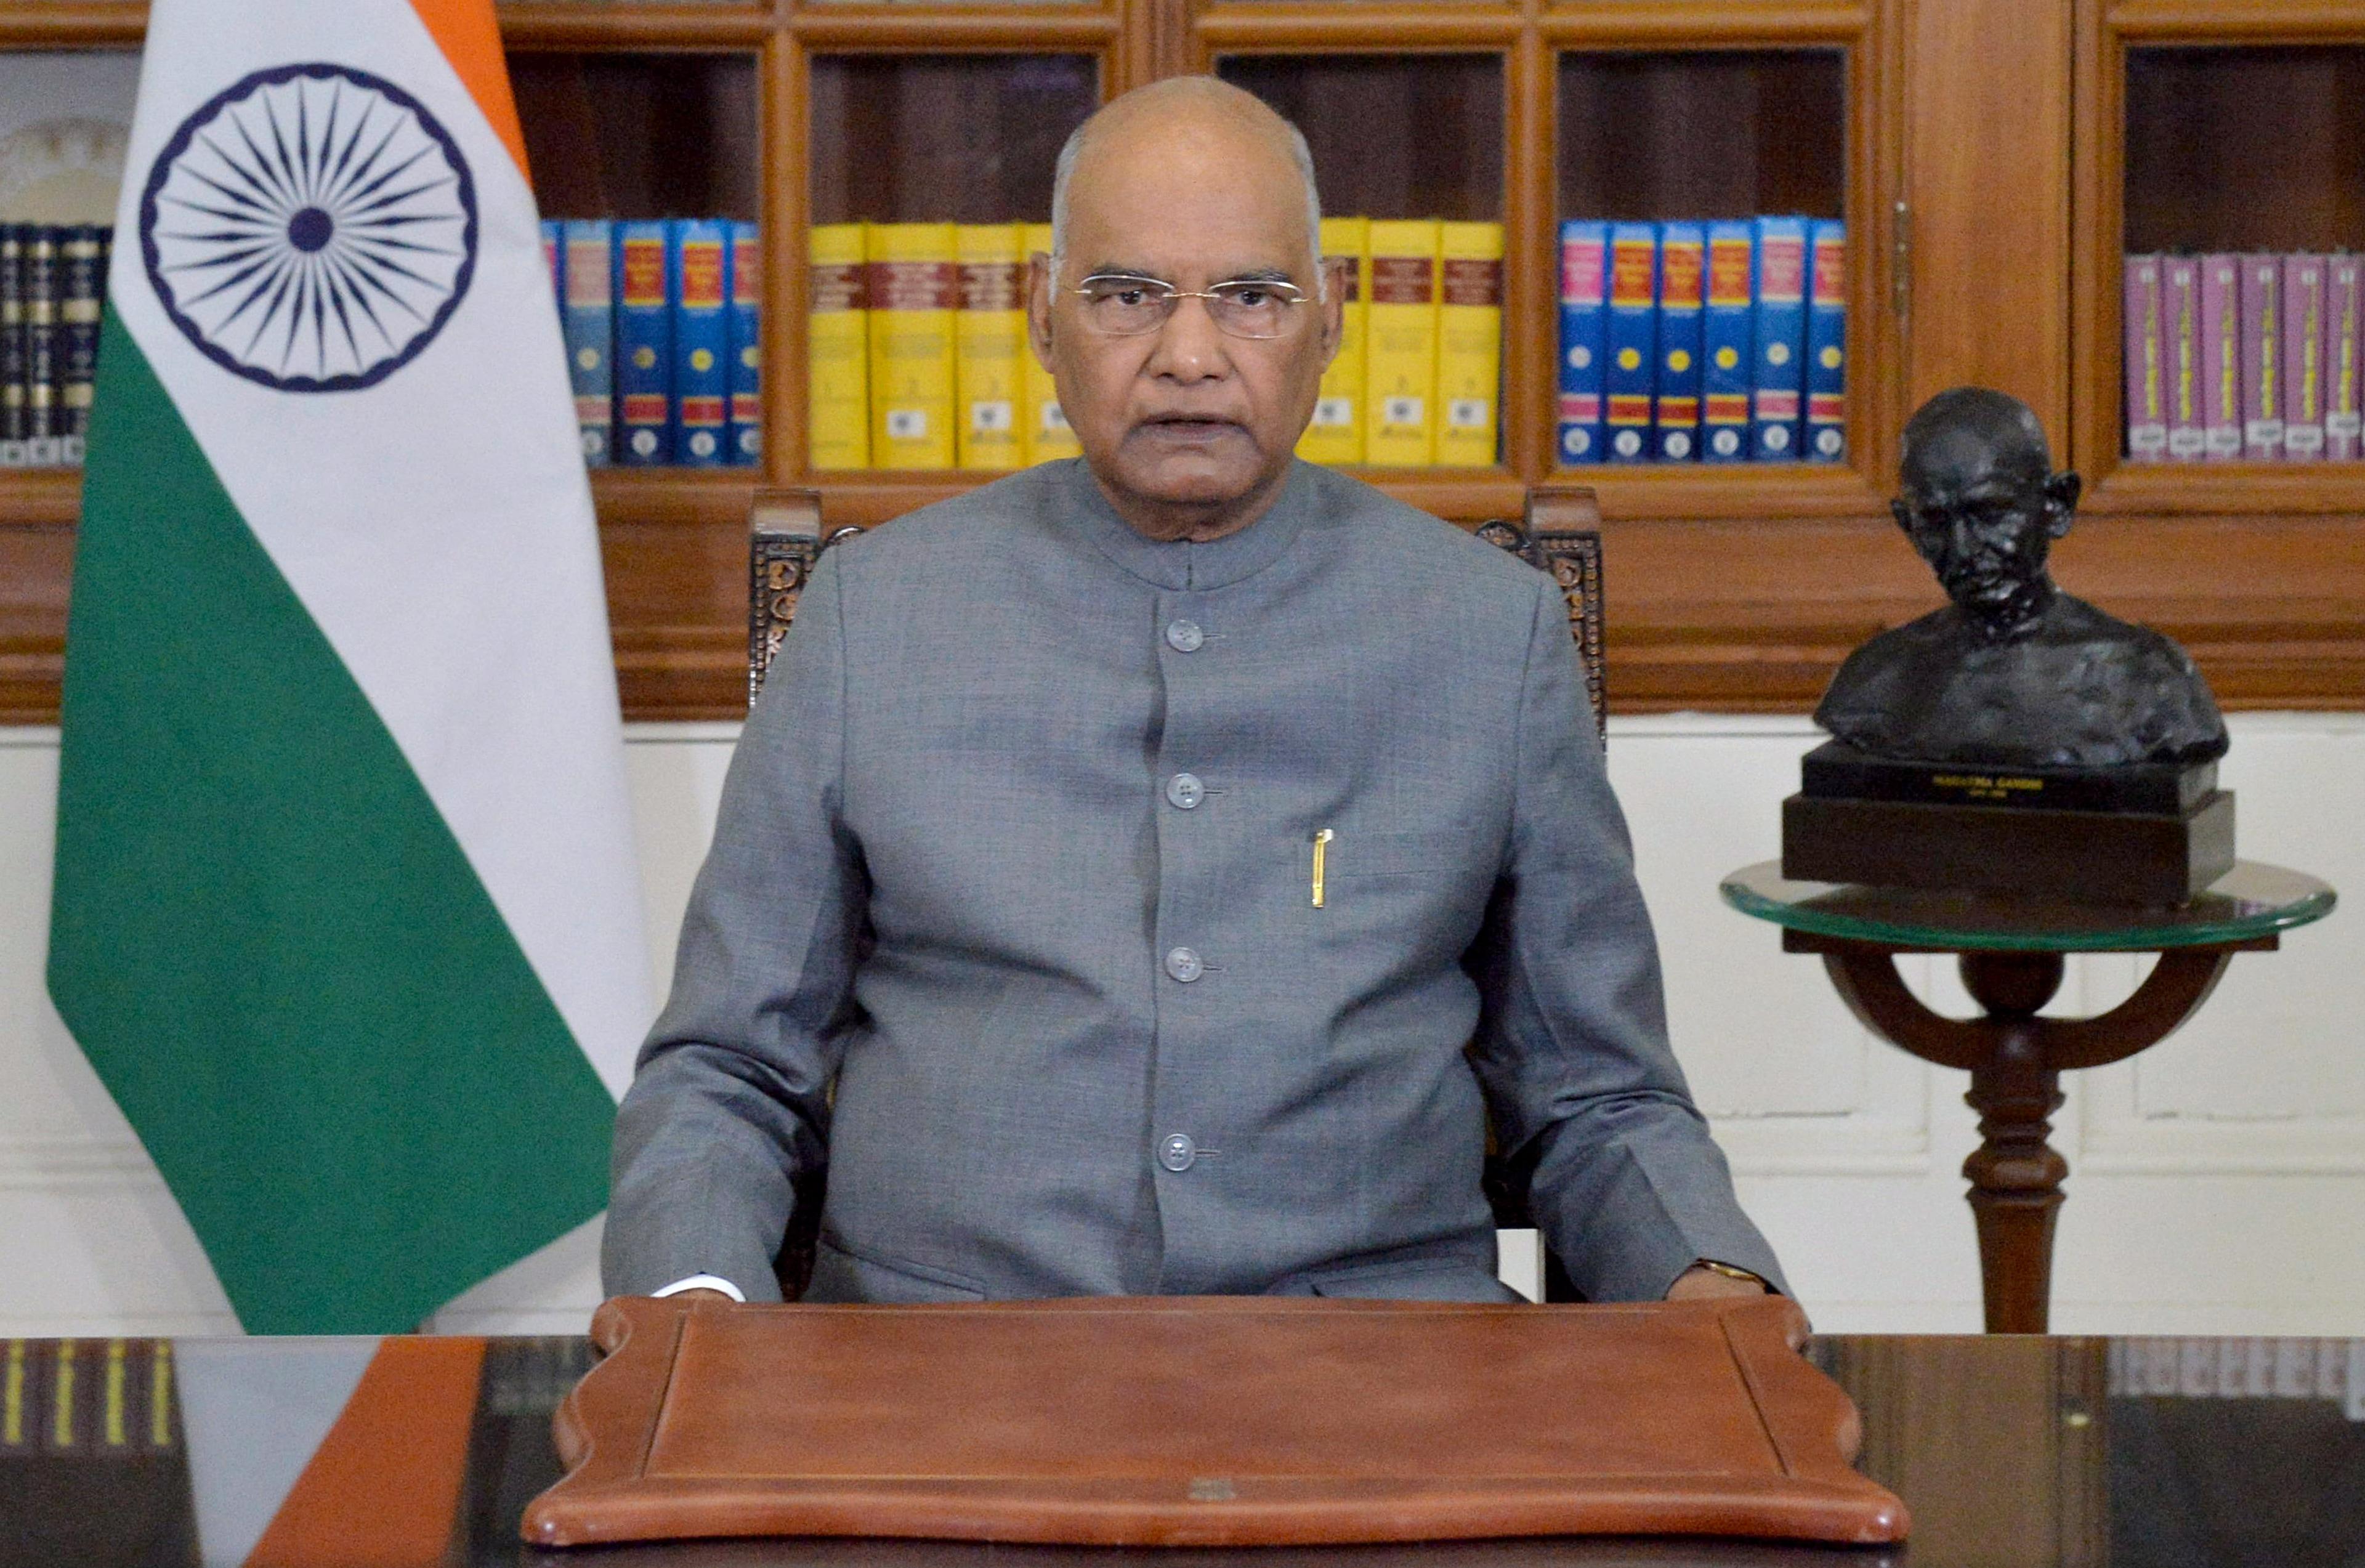 President Ram Nath Kovind addresses the nation on the eve of 72nd Republic Day